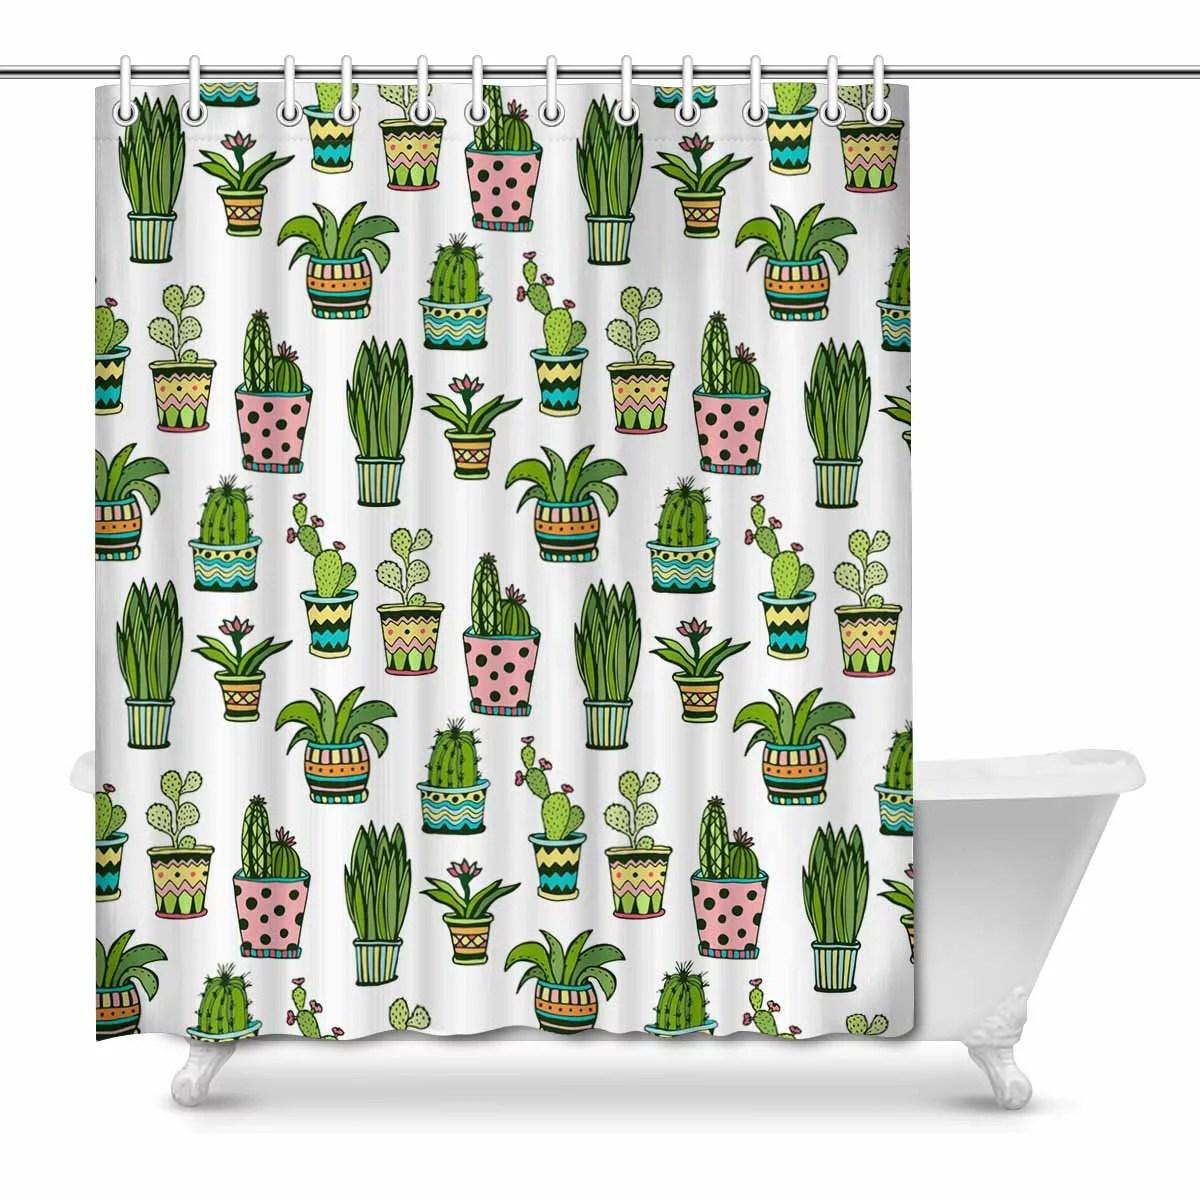 mkhert colorful doodle flowers watercolor succulent and cactus waterproof shower curtain decor fabric bathroom set 66x72 inch walmart com